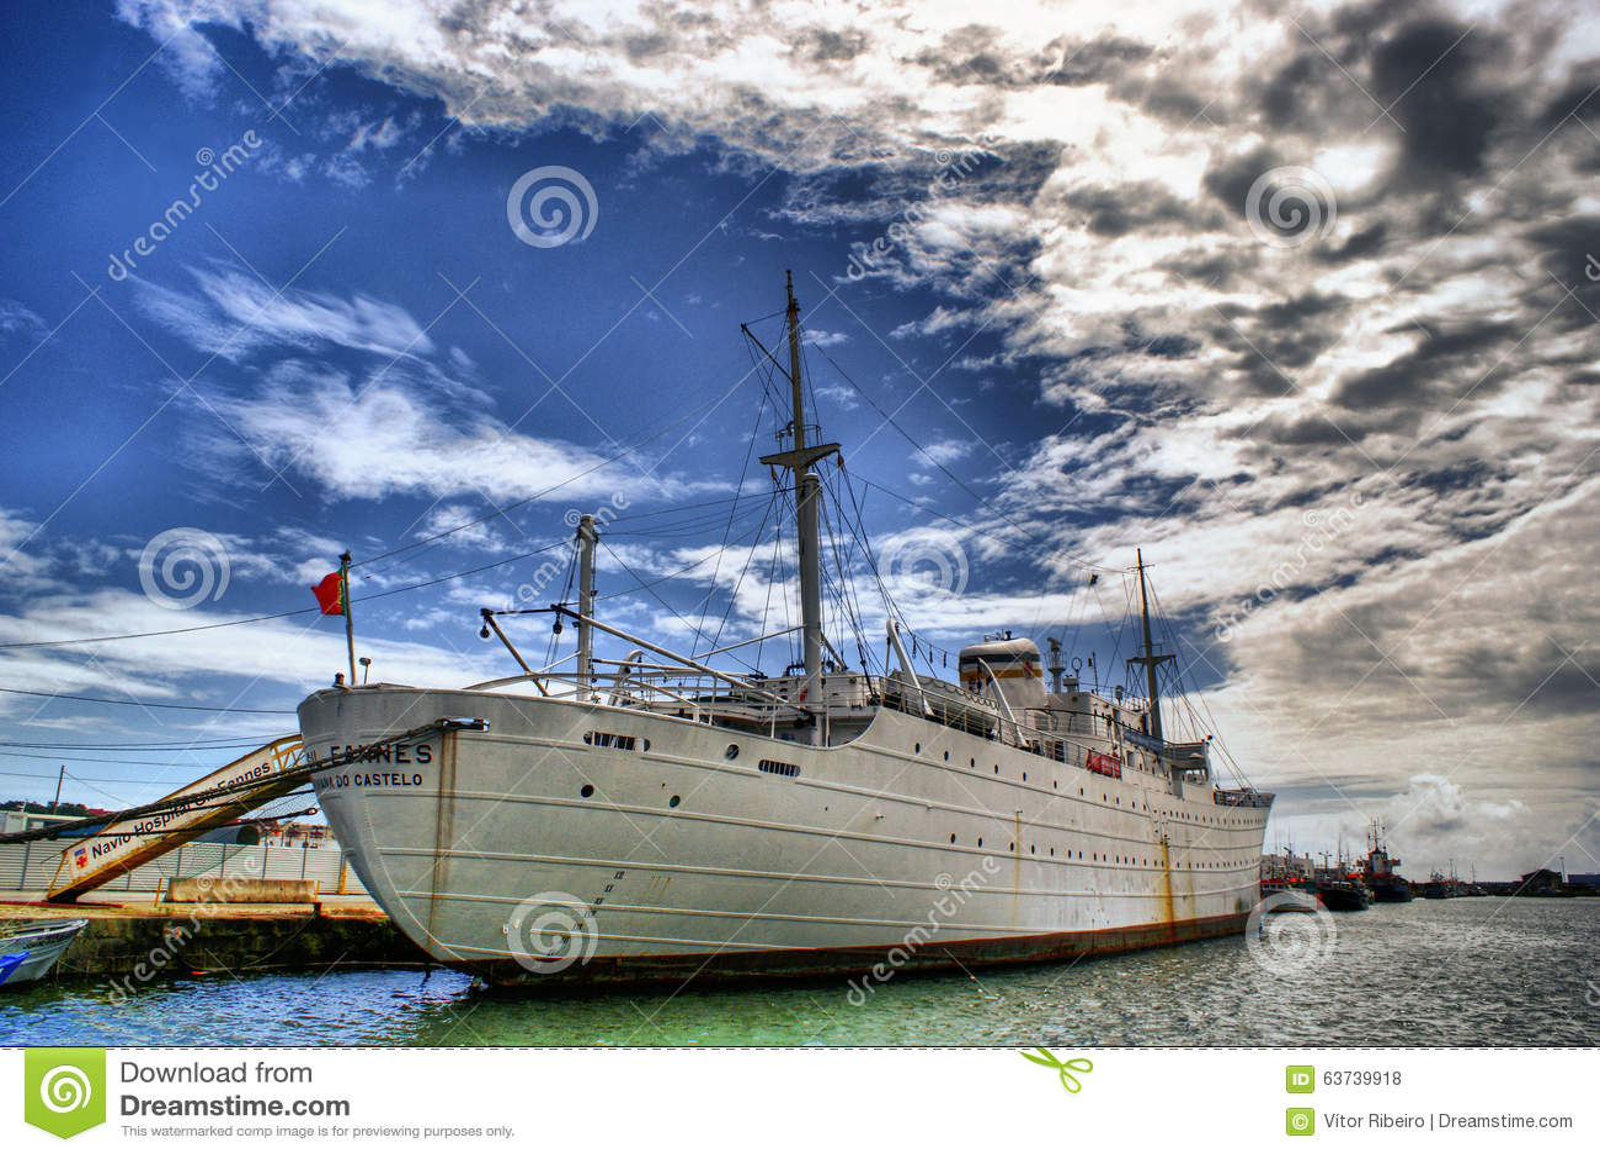 The historical medical ship Gil Eanes in Viana do Castelo